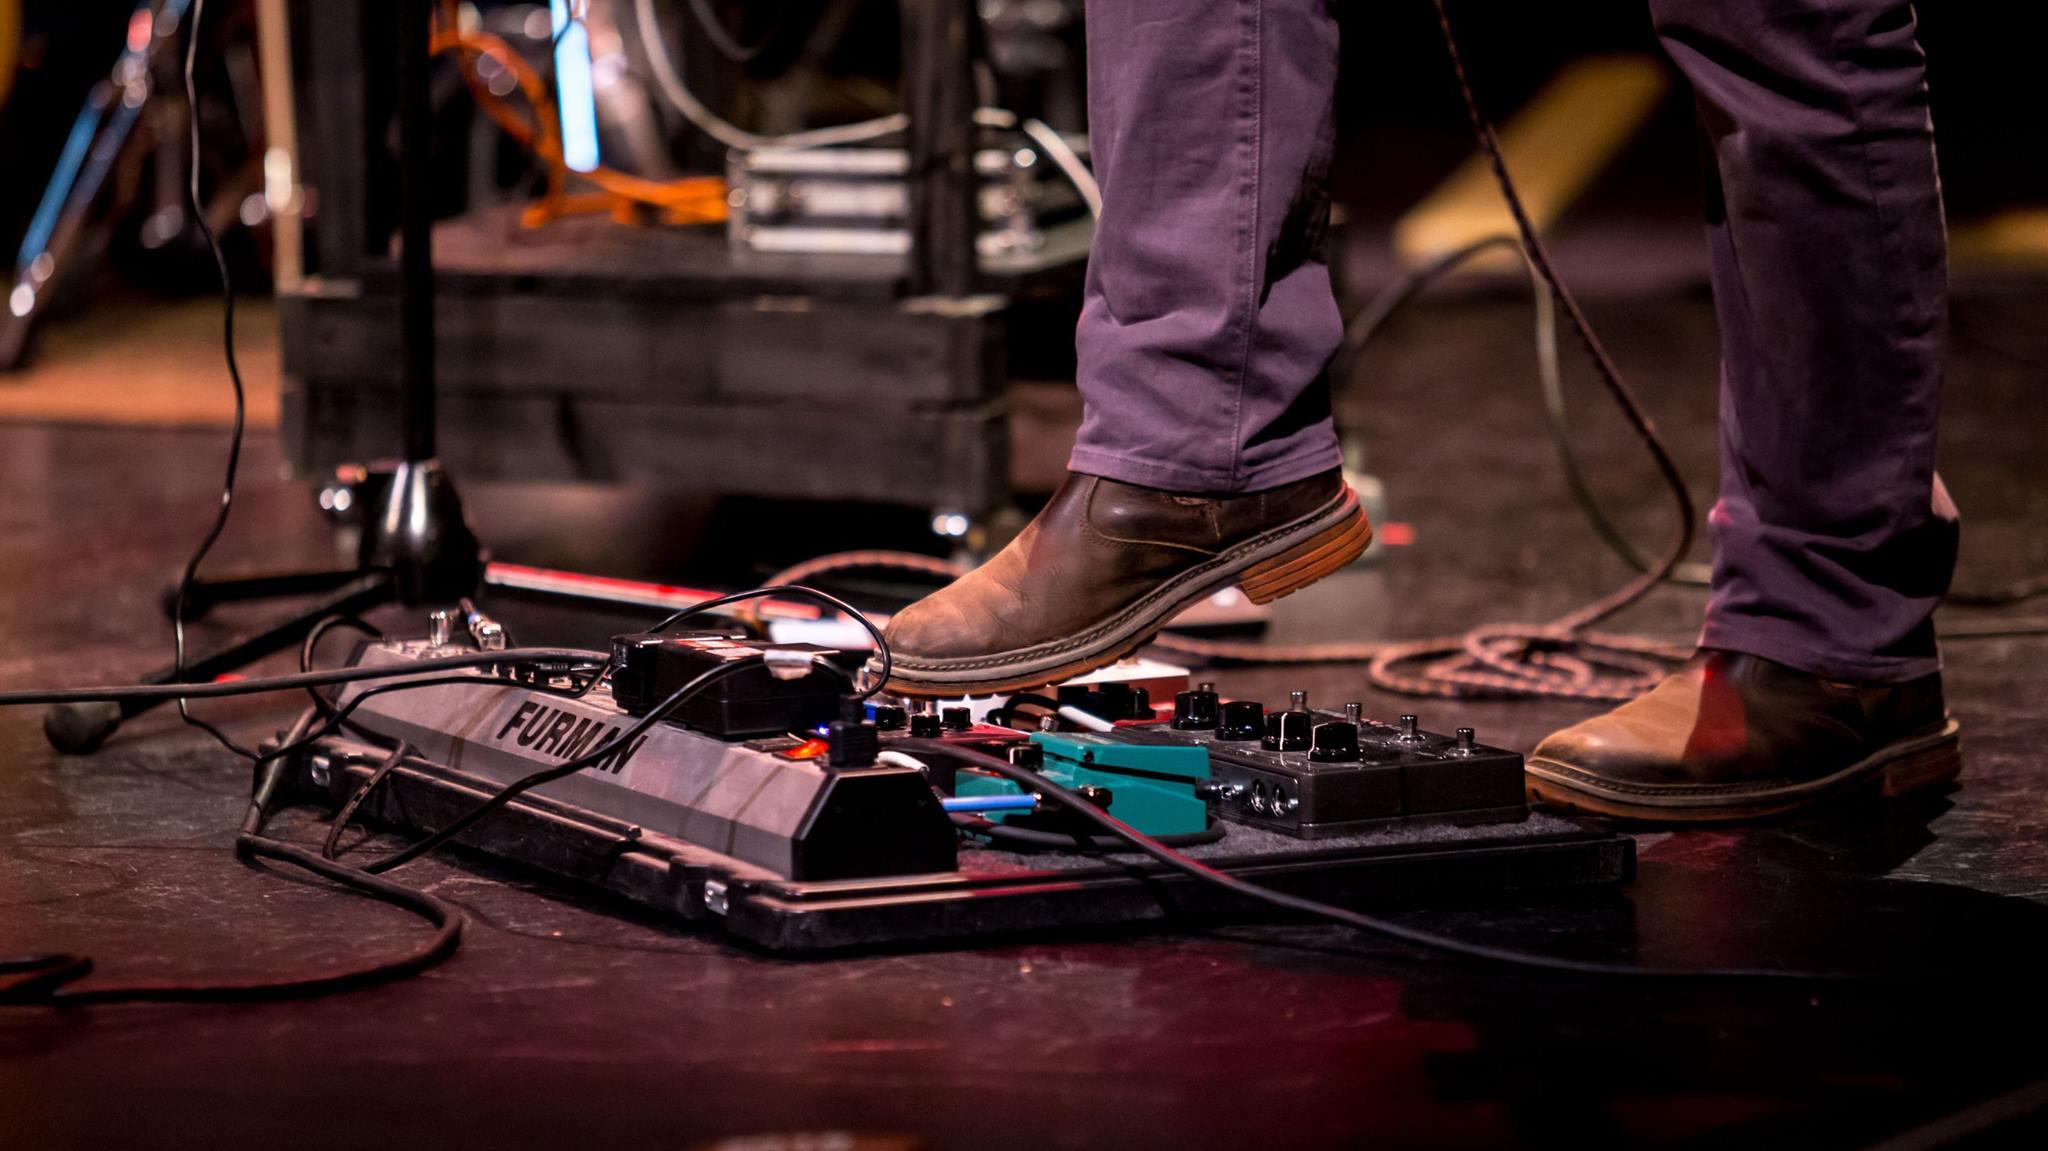 Triptet @ NUMUS Northwest in Seattle - Tom's Feet Photo by James Holt